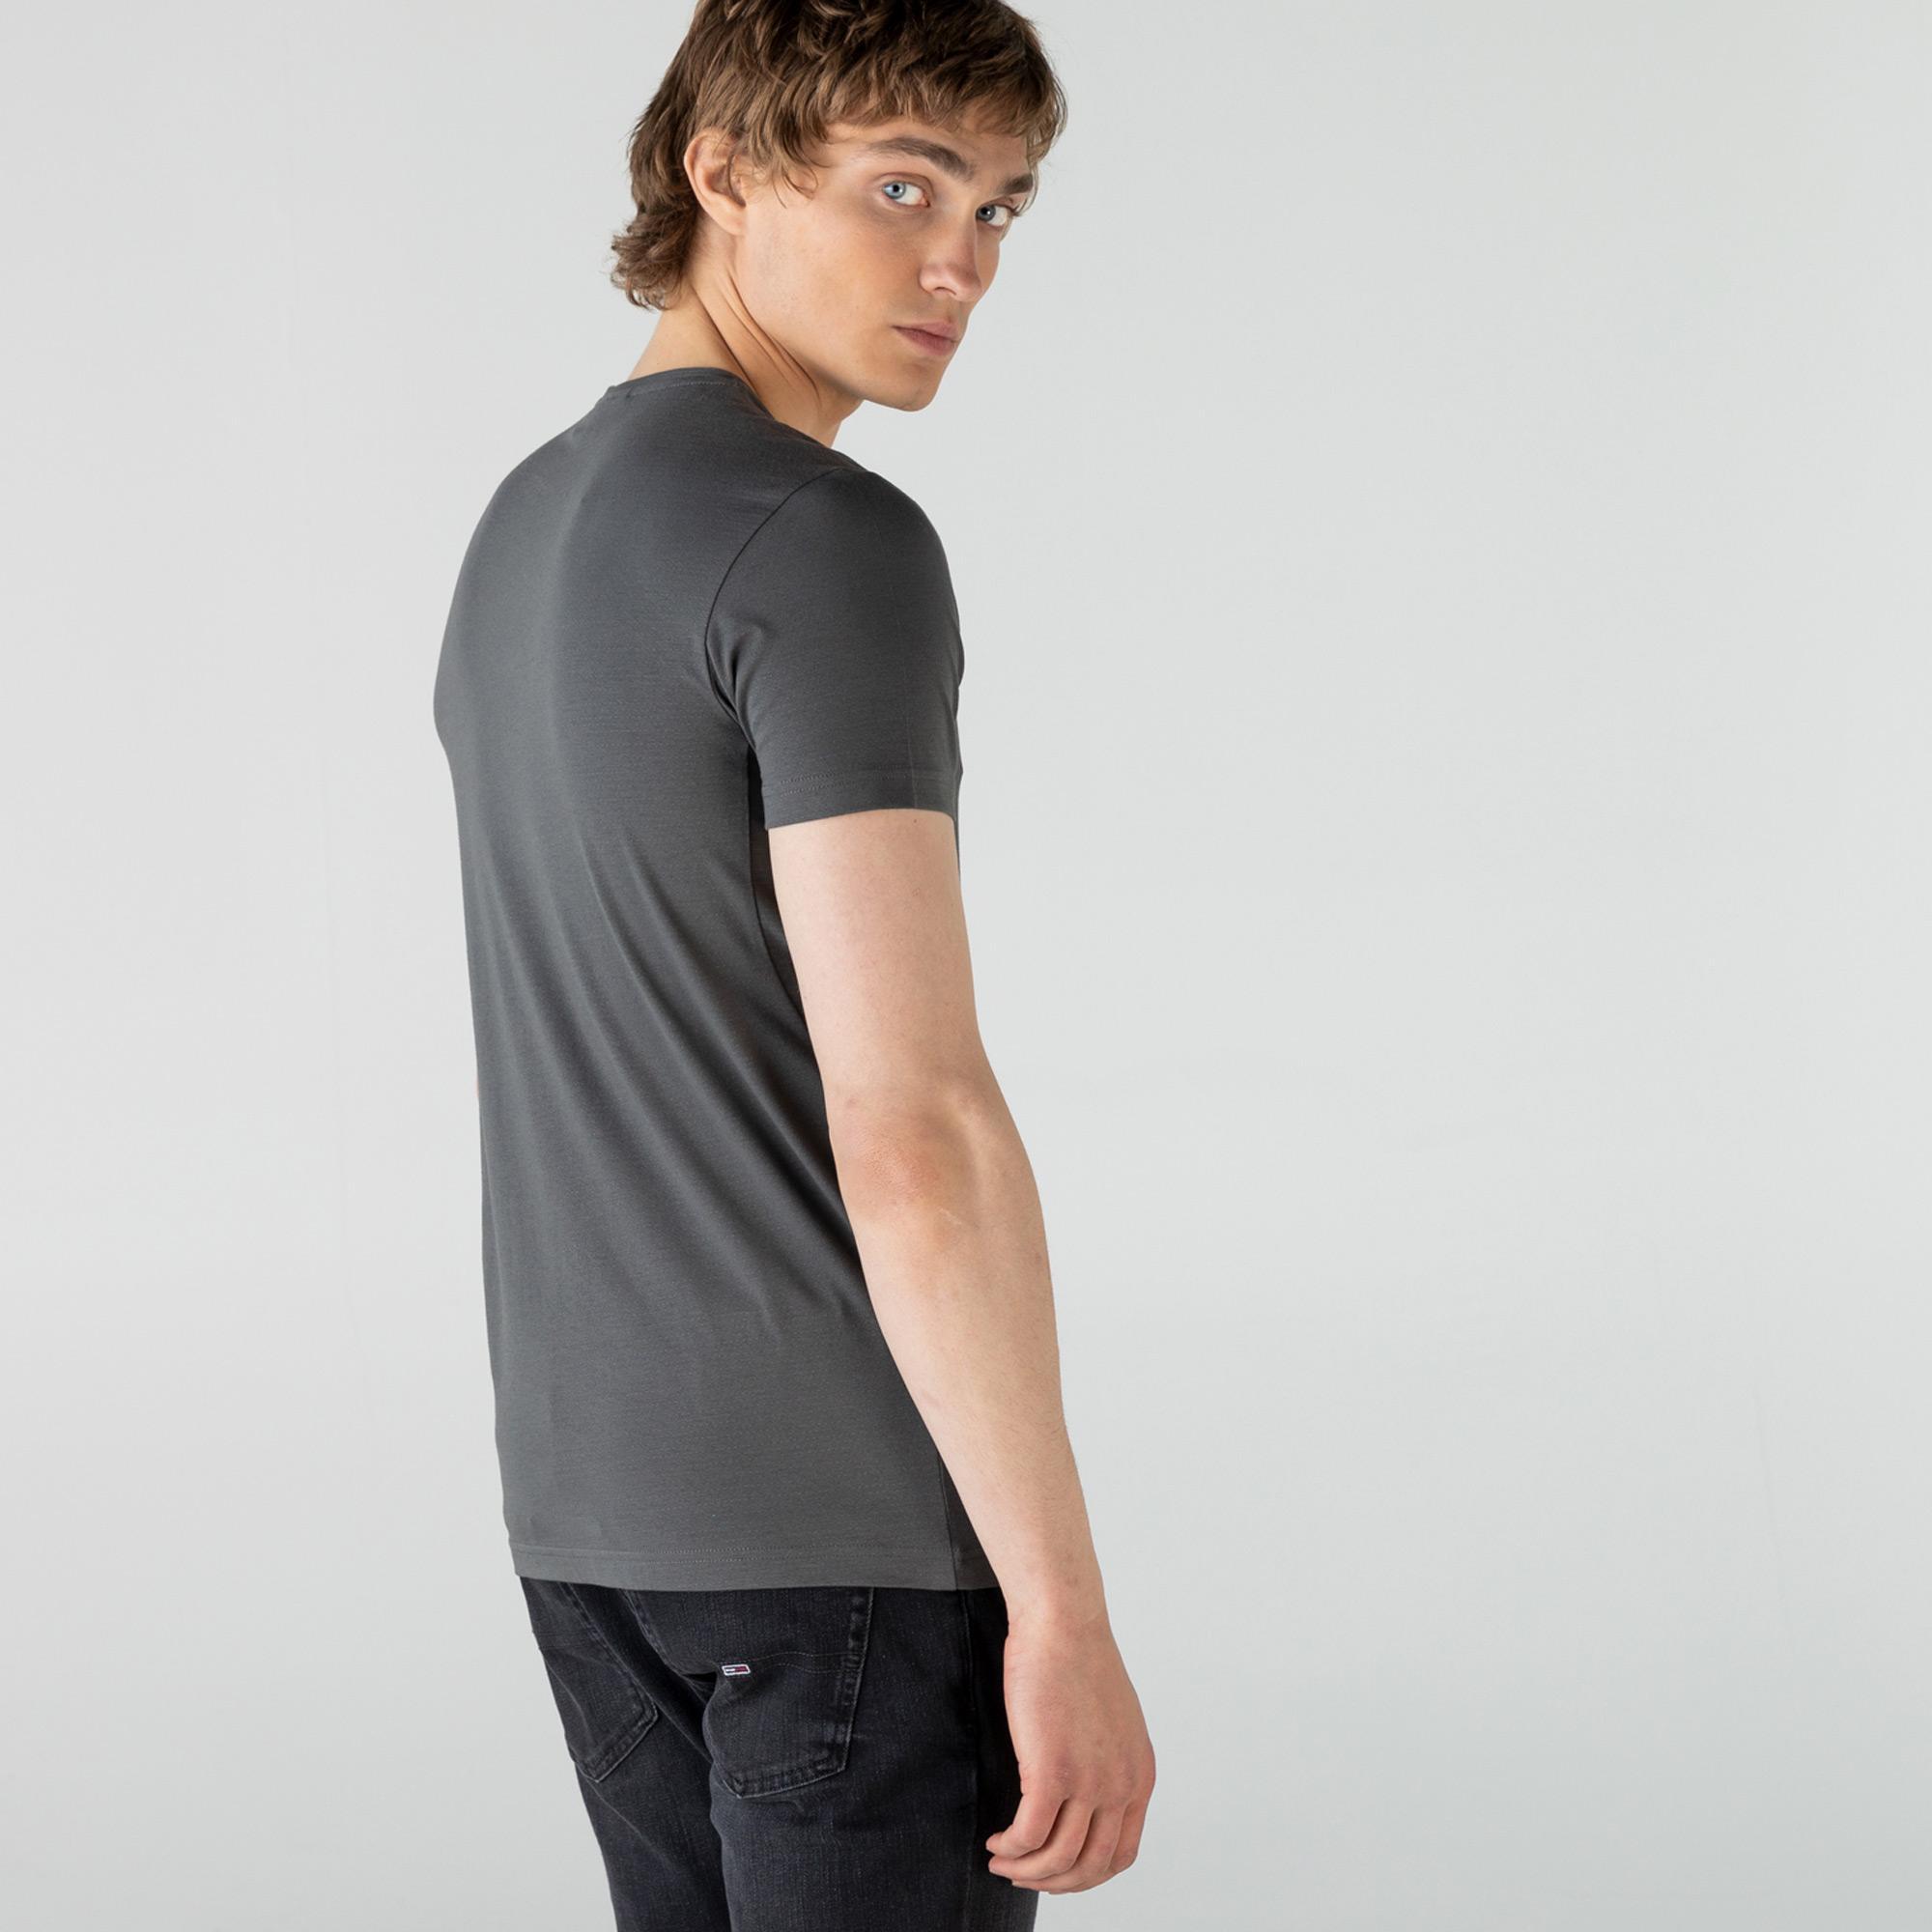 Lacoste Erkek Slim Fit Gri T-Shirt